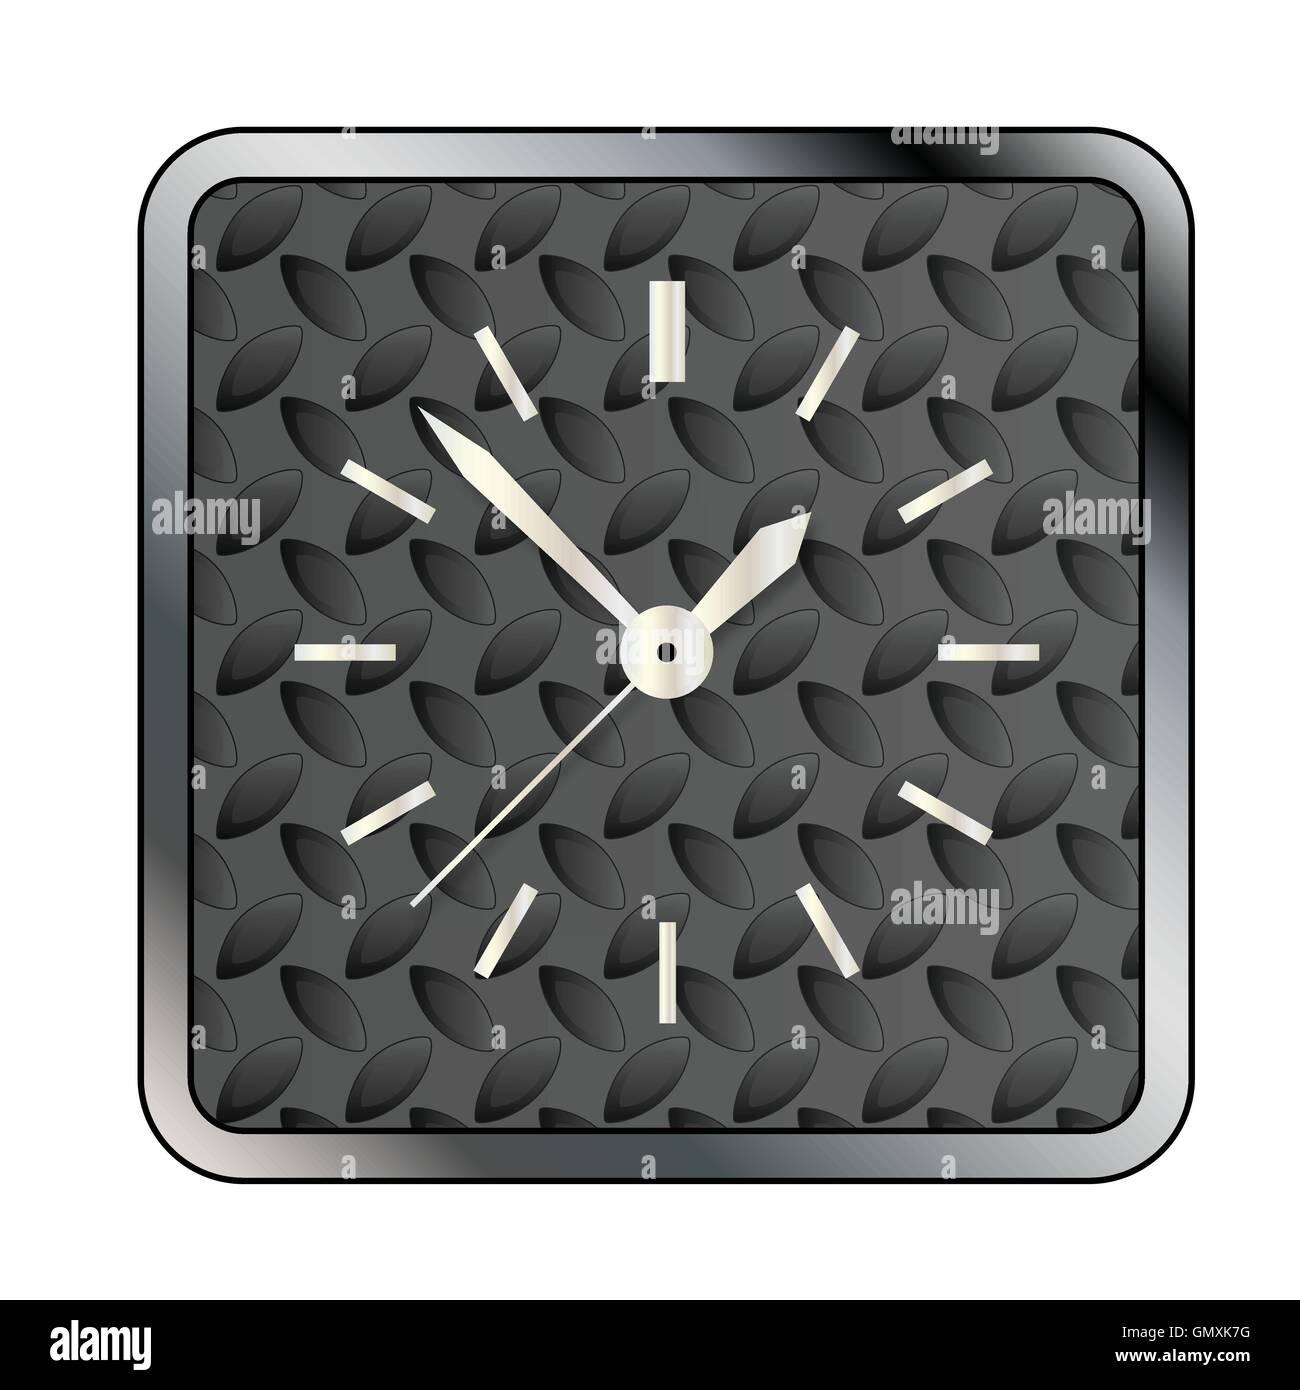 Metal Tread Clock Face - Stock Image